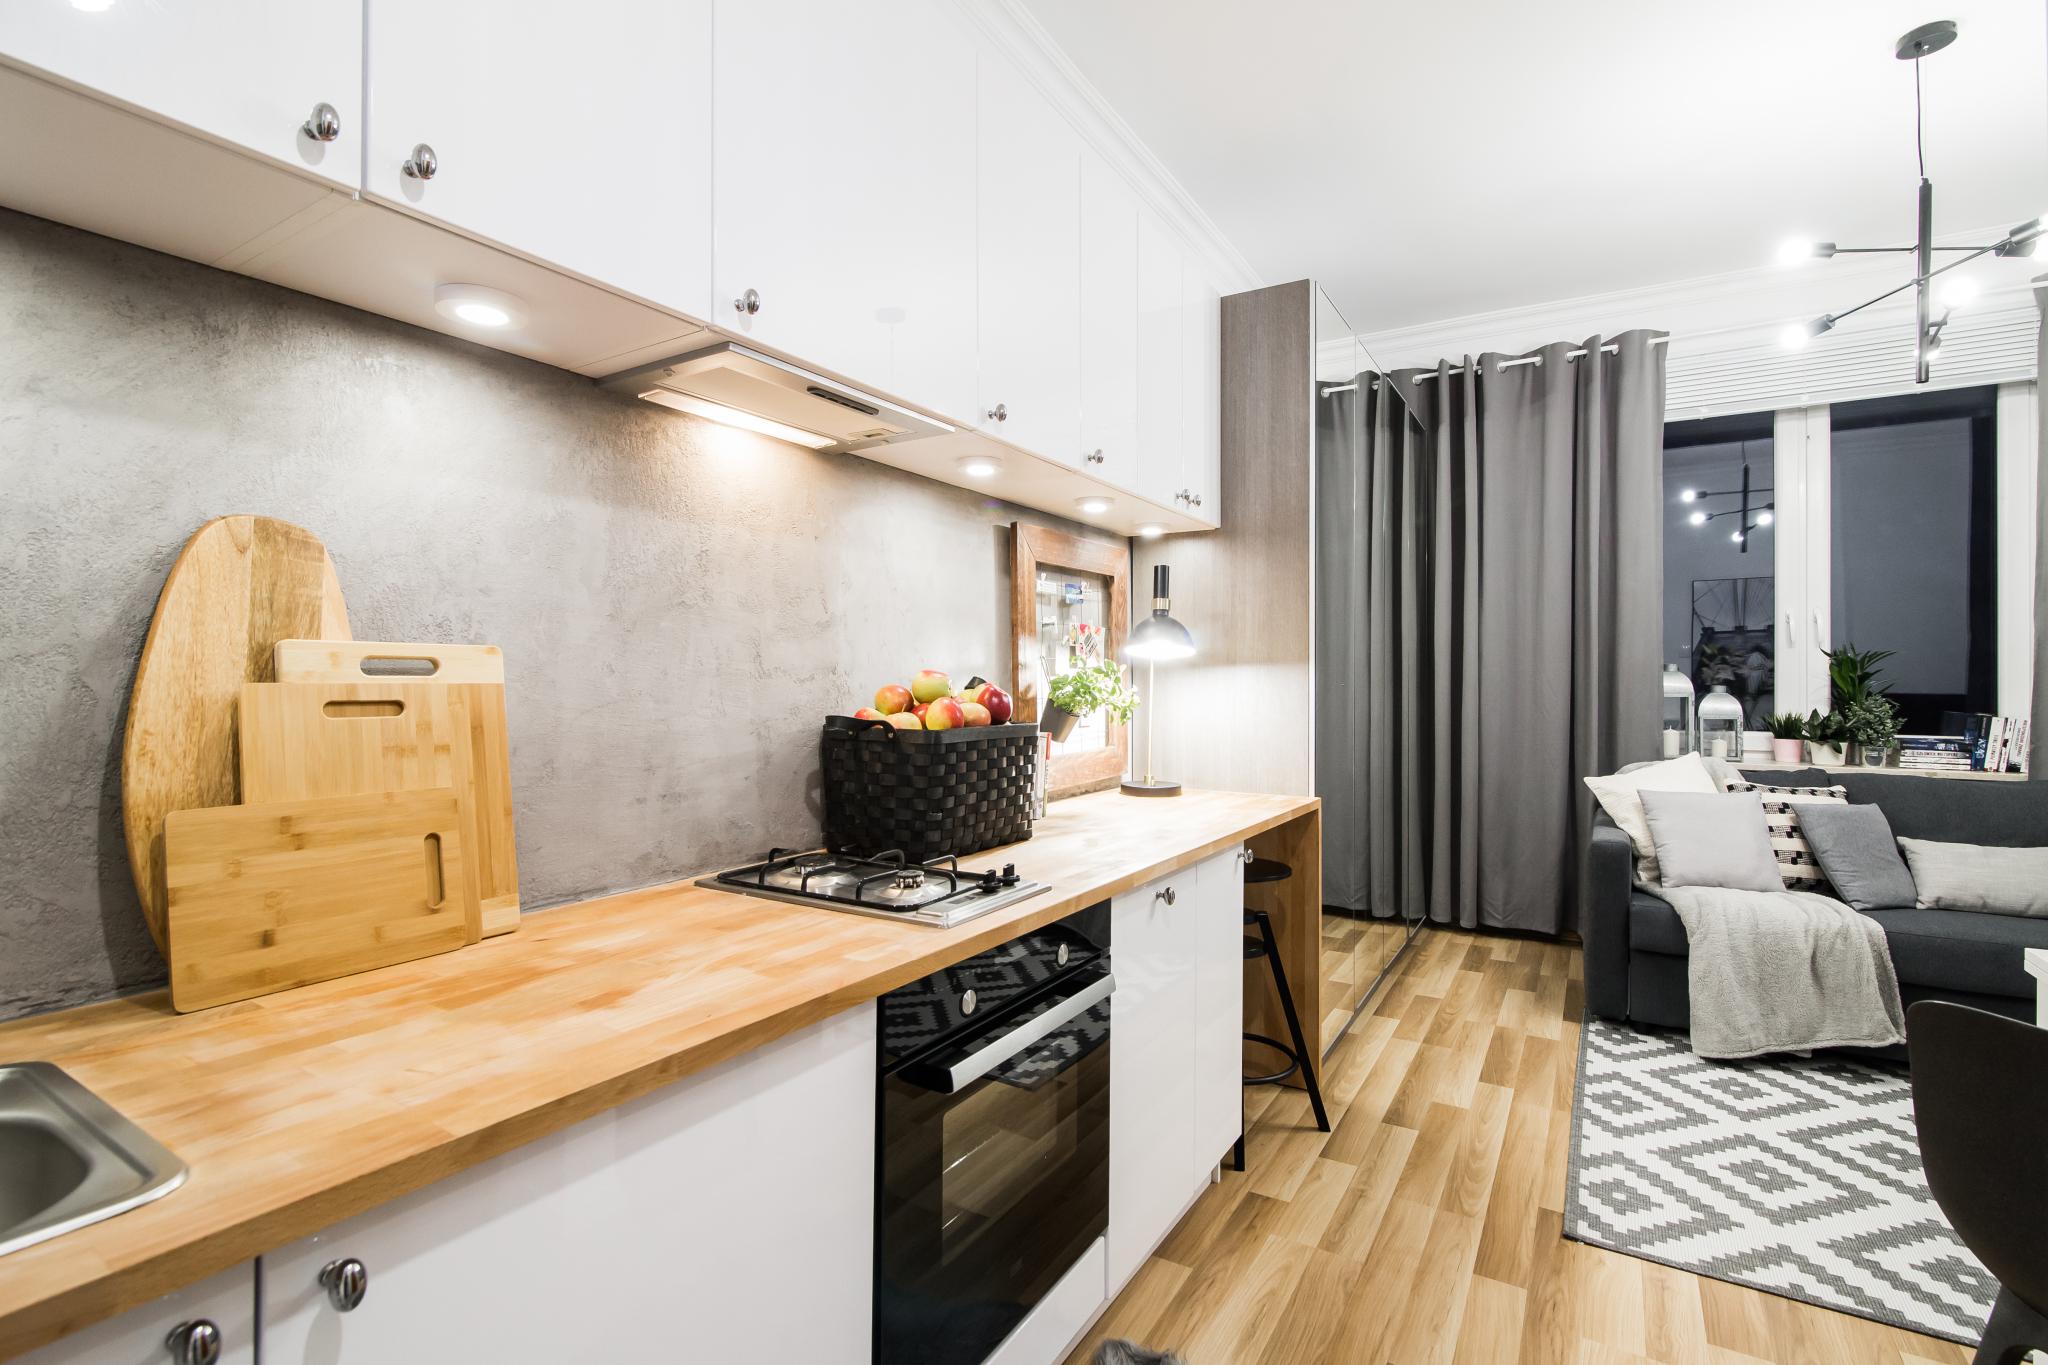 Dorota Inspiruje Miniaturowe Mieszkanie Karoliny I Kamila